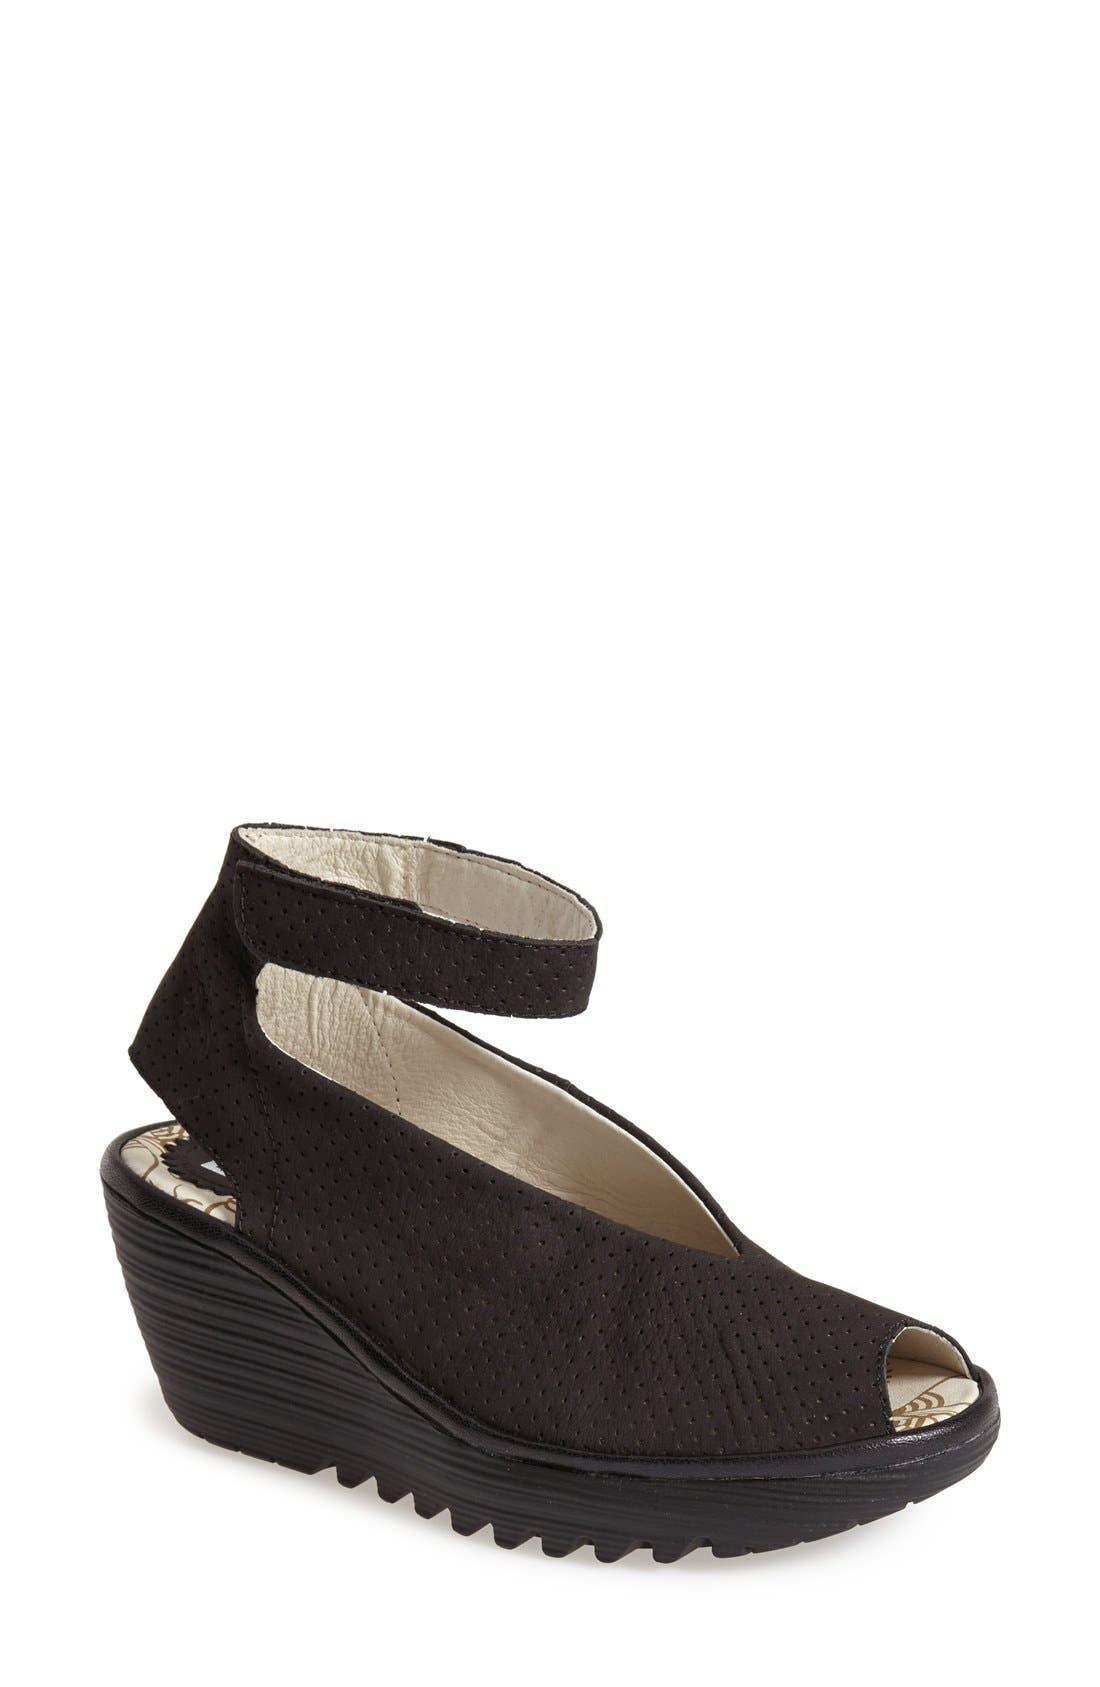 Fly London 'Yala' Perforated Leather Sandal